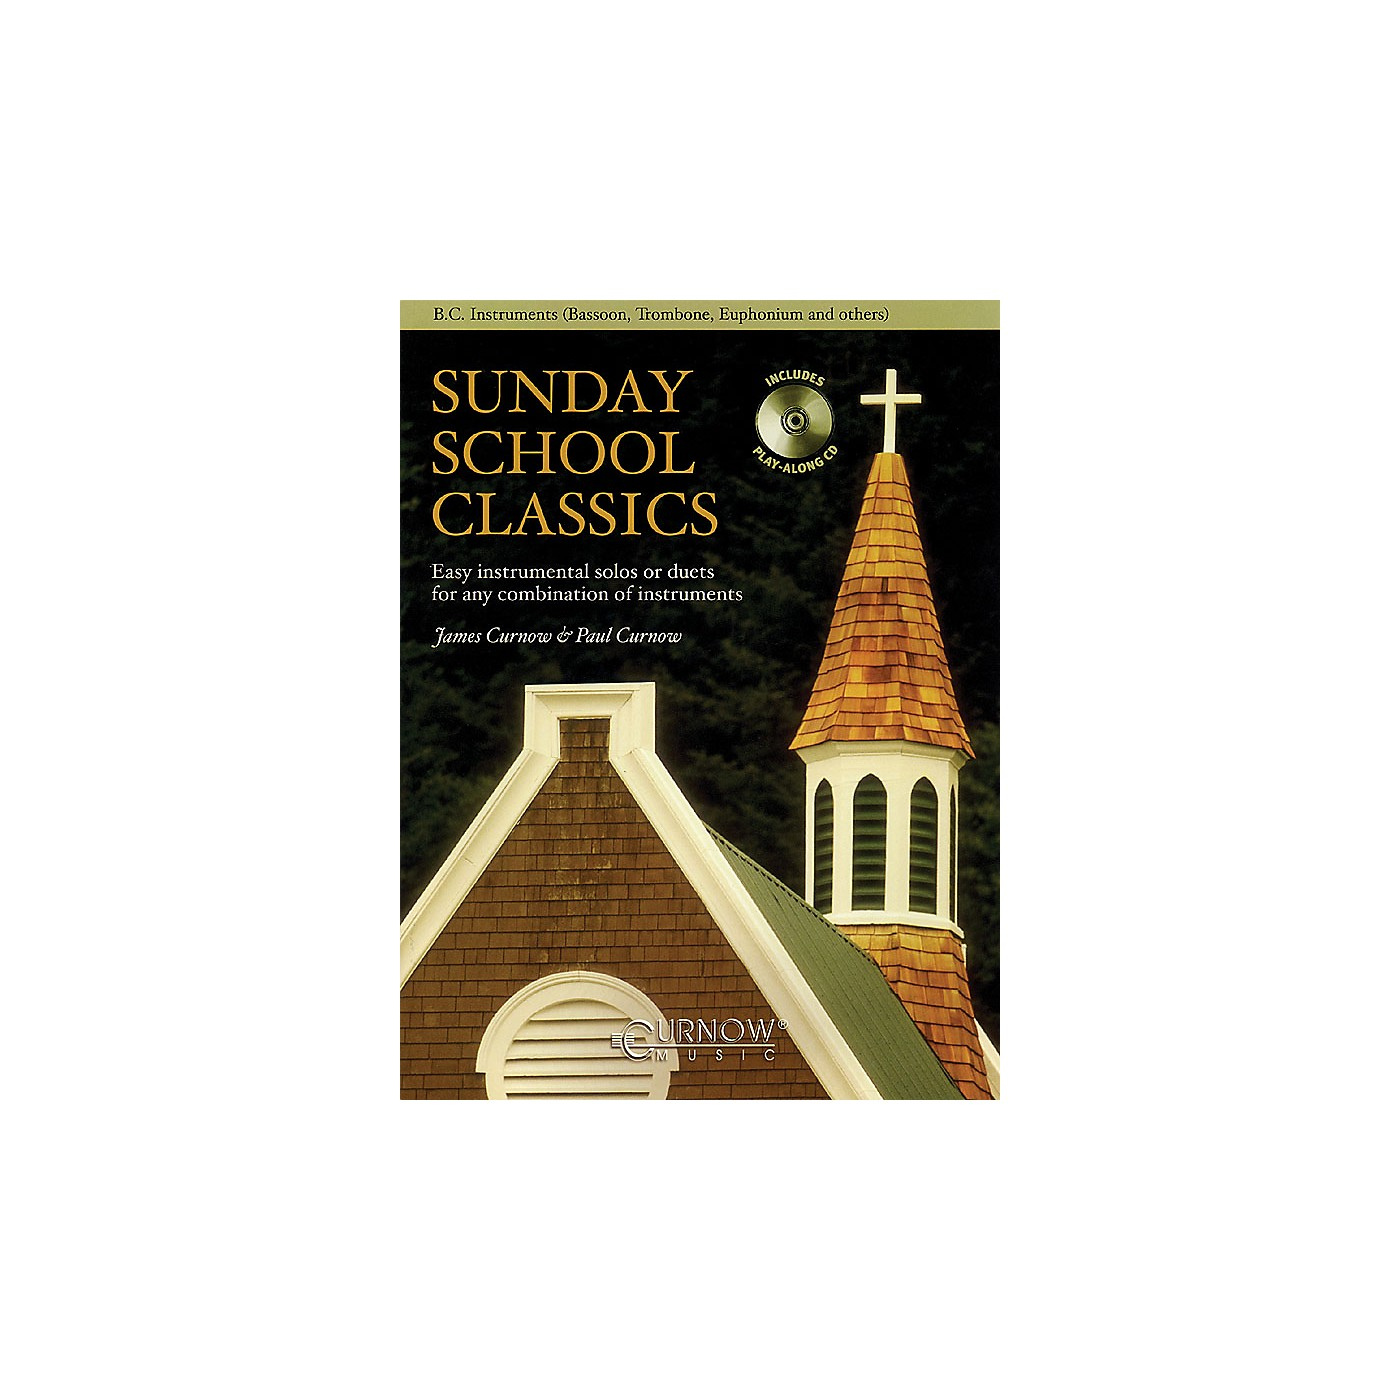 Curnow Music Sunday School Classics (For B.C. Instruments - Grade 2.5) Concert Band Level 2.5 thumbnail